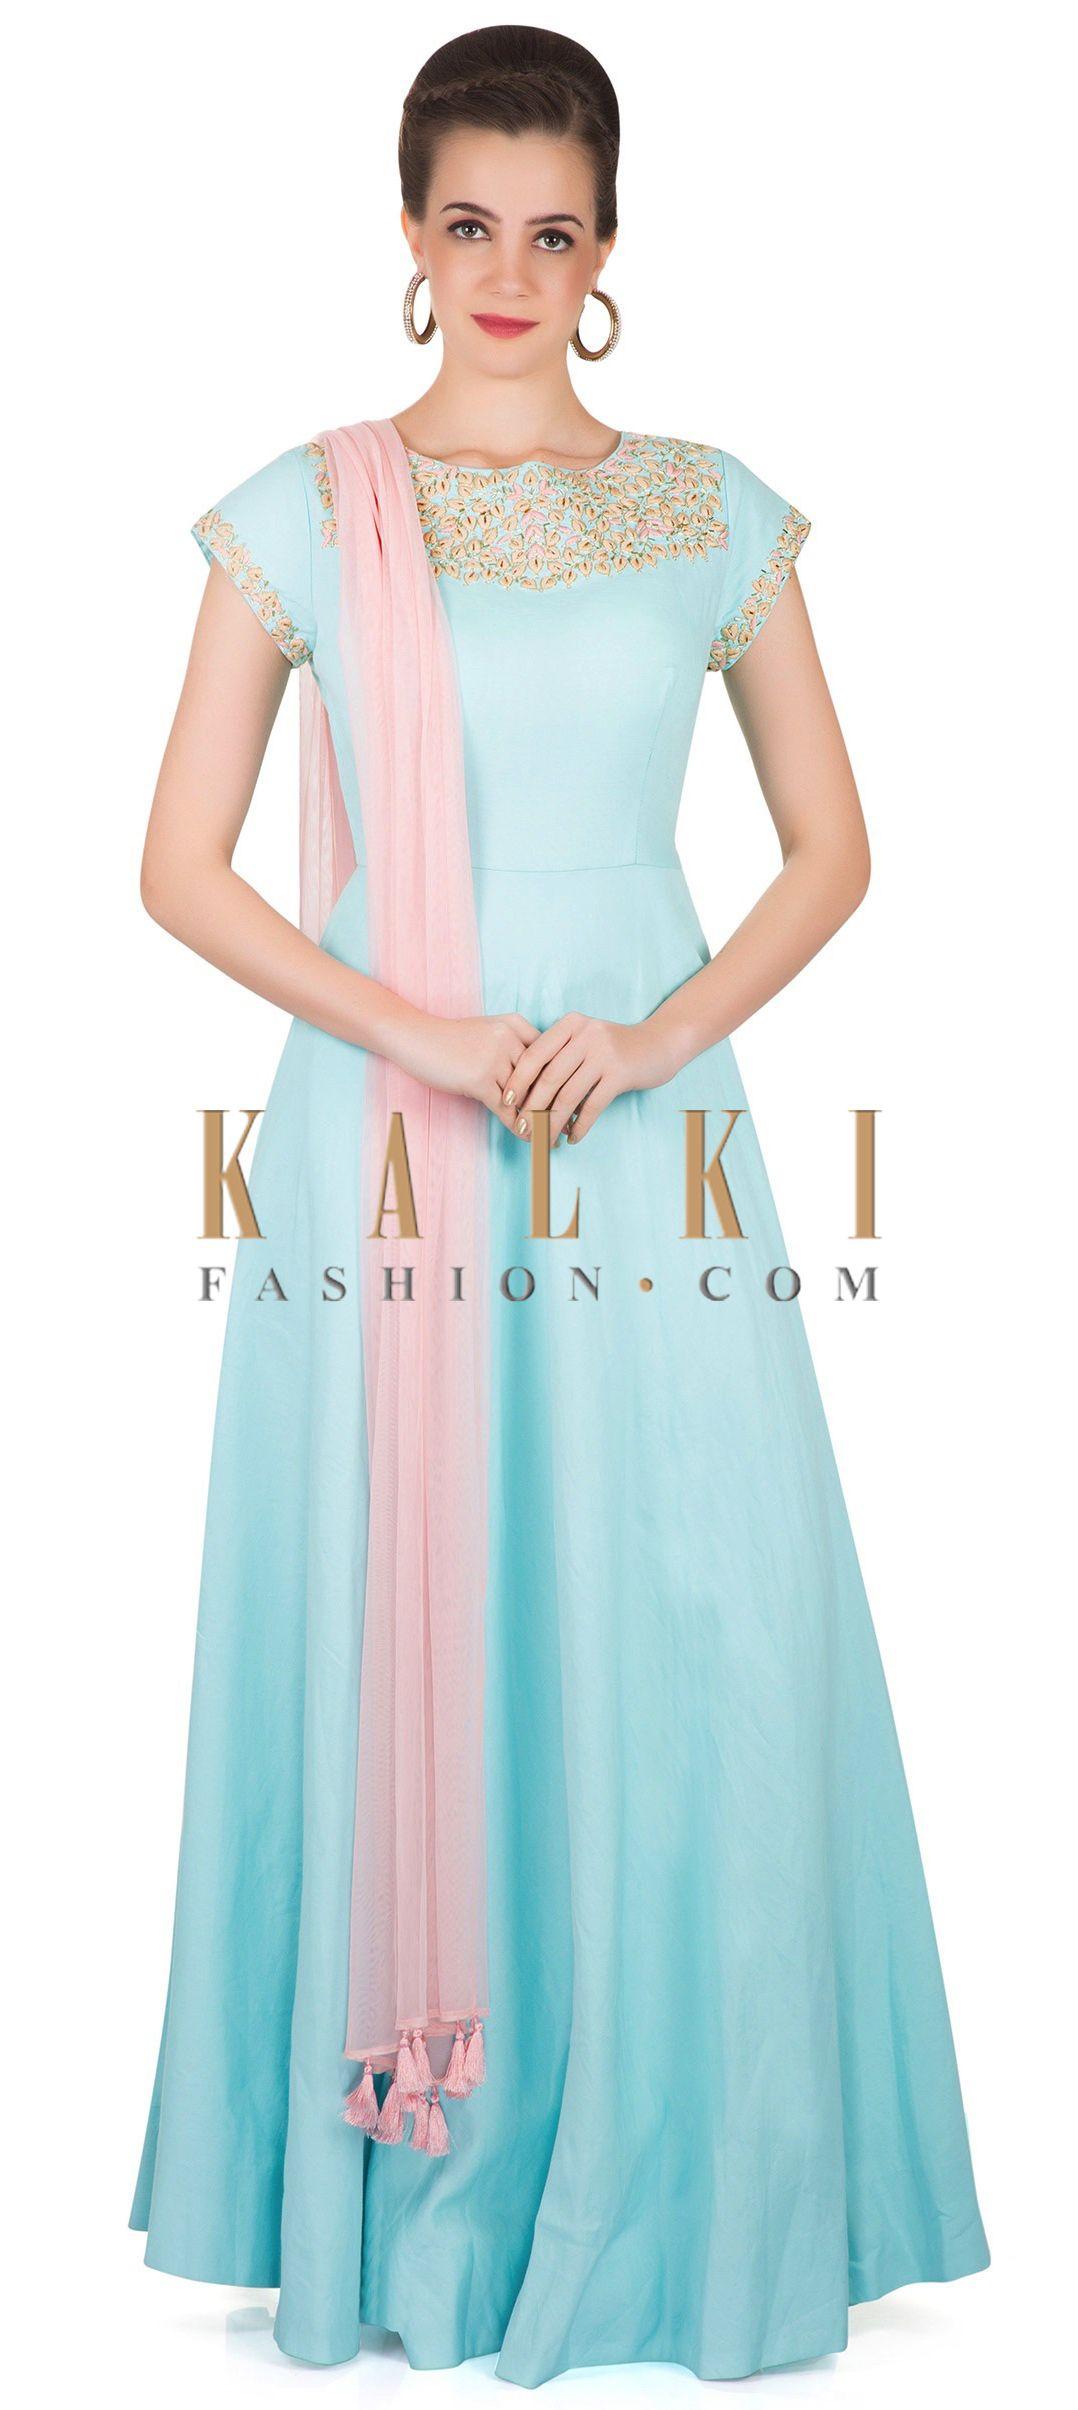 995dc6b266 Blue Cotton Silk Churidar Kameez Decorated with Cut Dana, Thread and  Zardosi Work only on Kalki